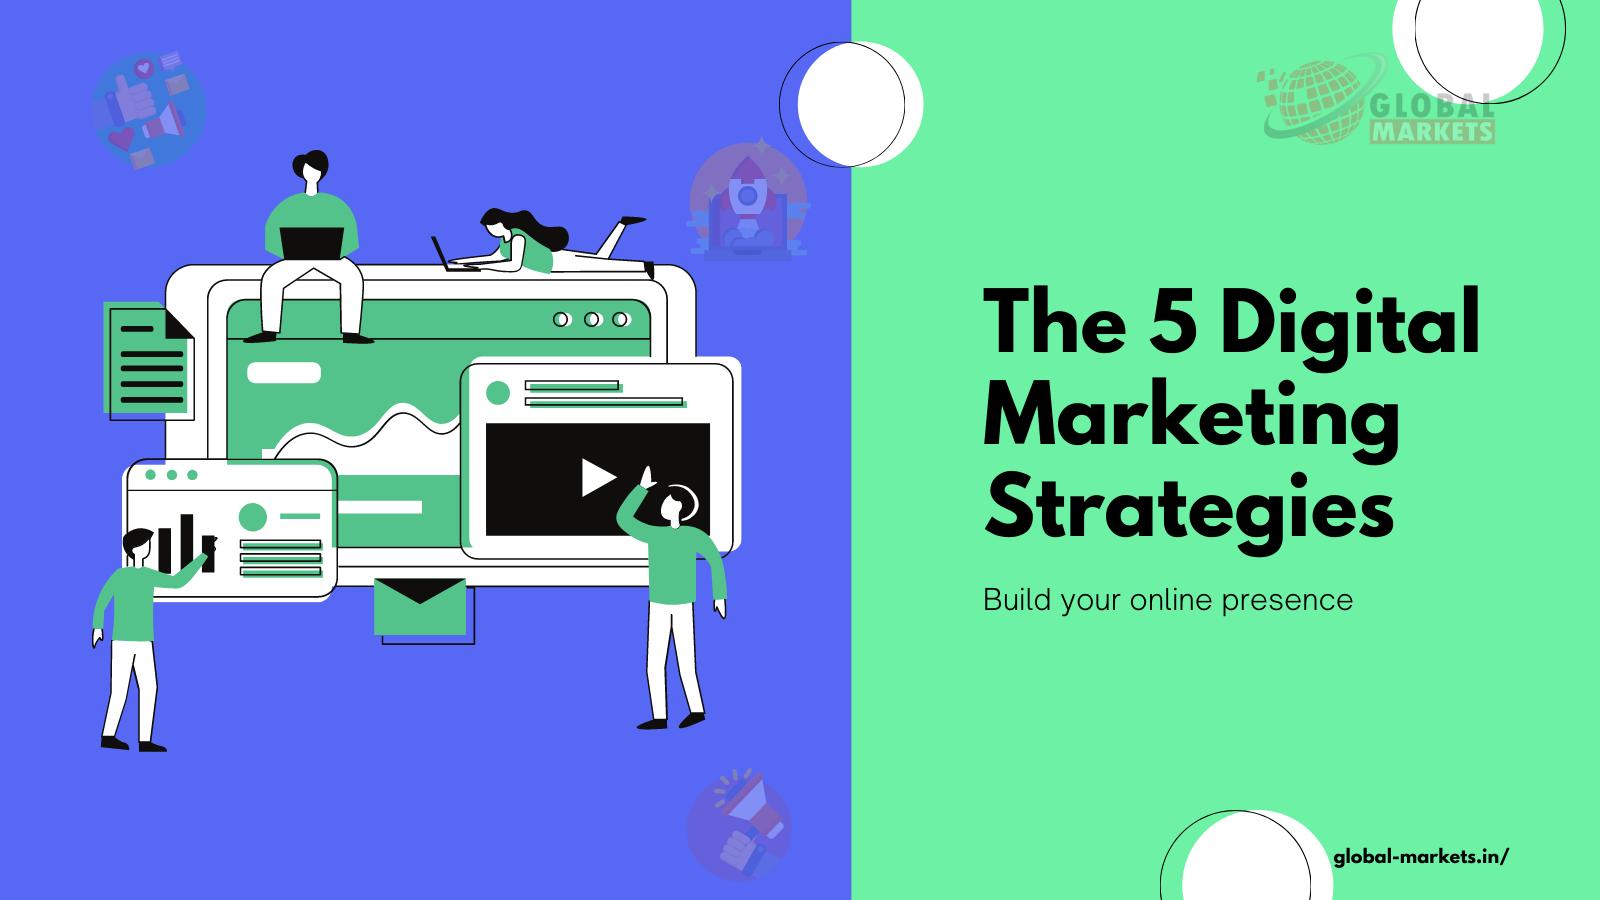 Post-COVID-19 Pandemic Digital Marketing Strategies for Long-Term Benefits